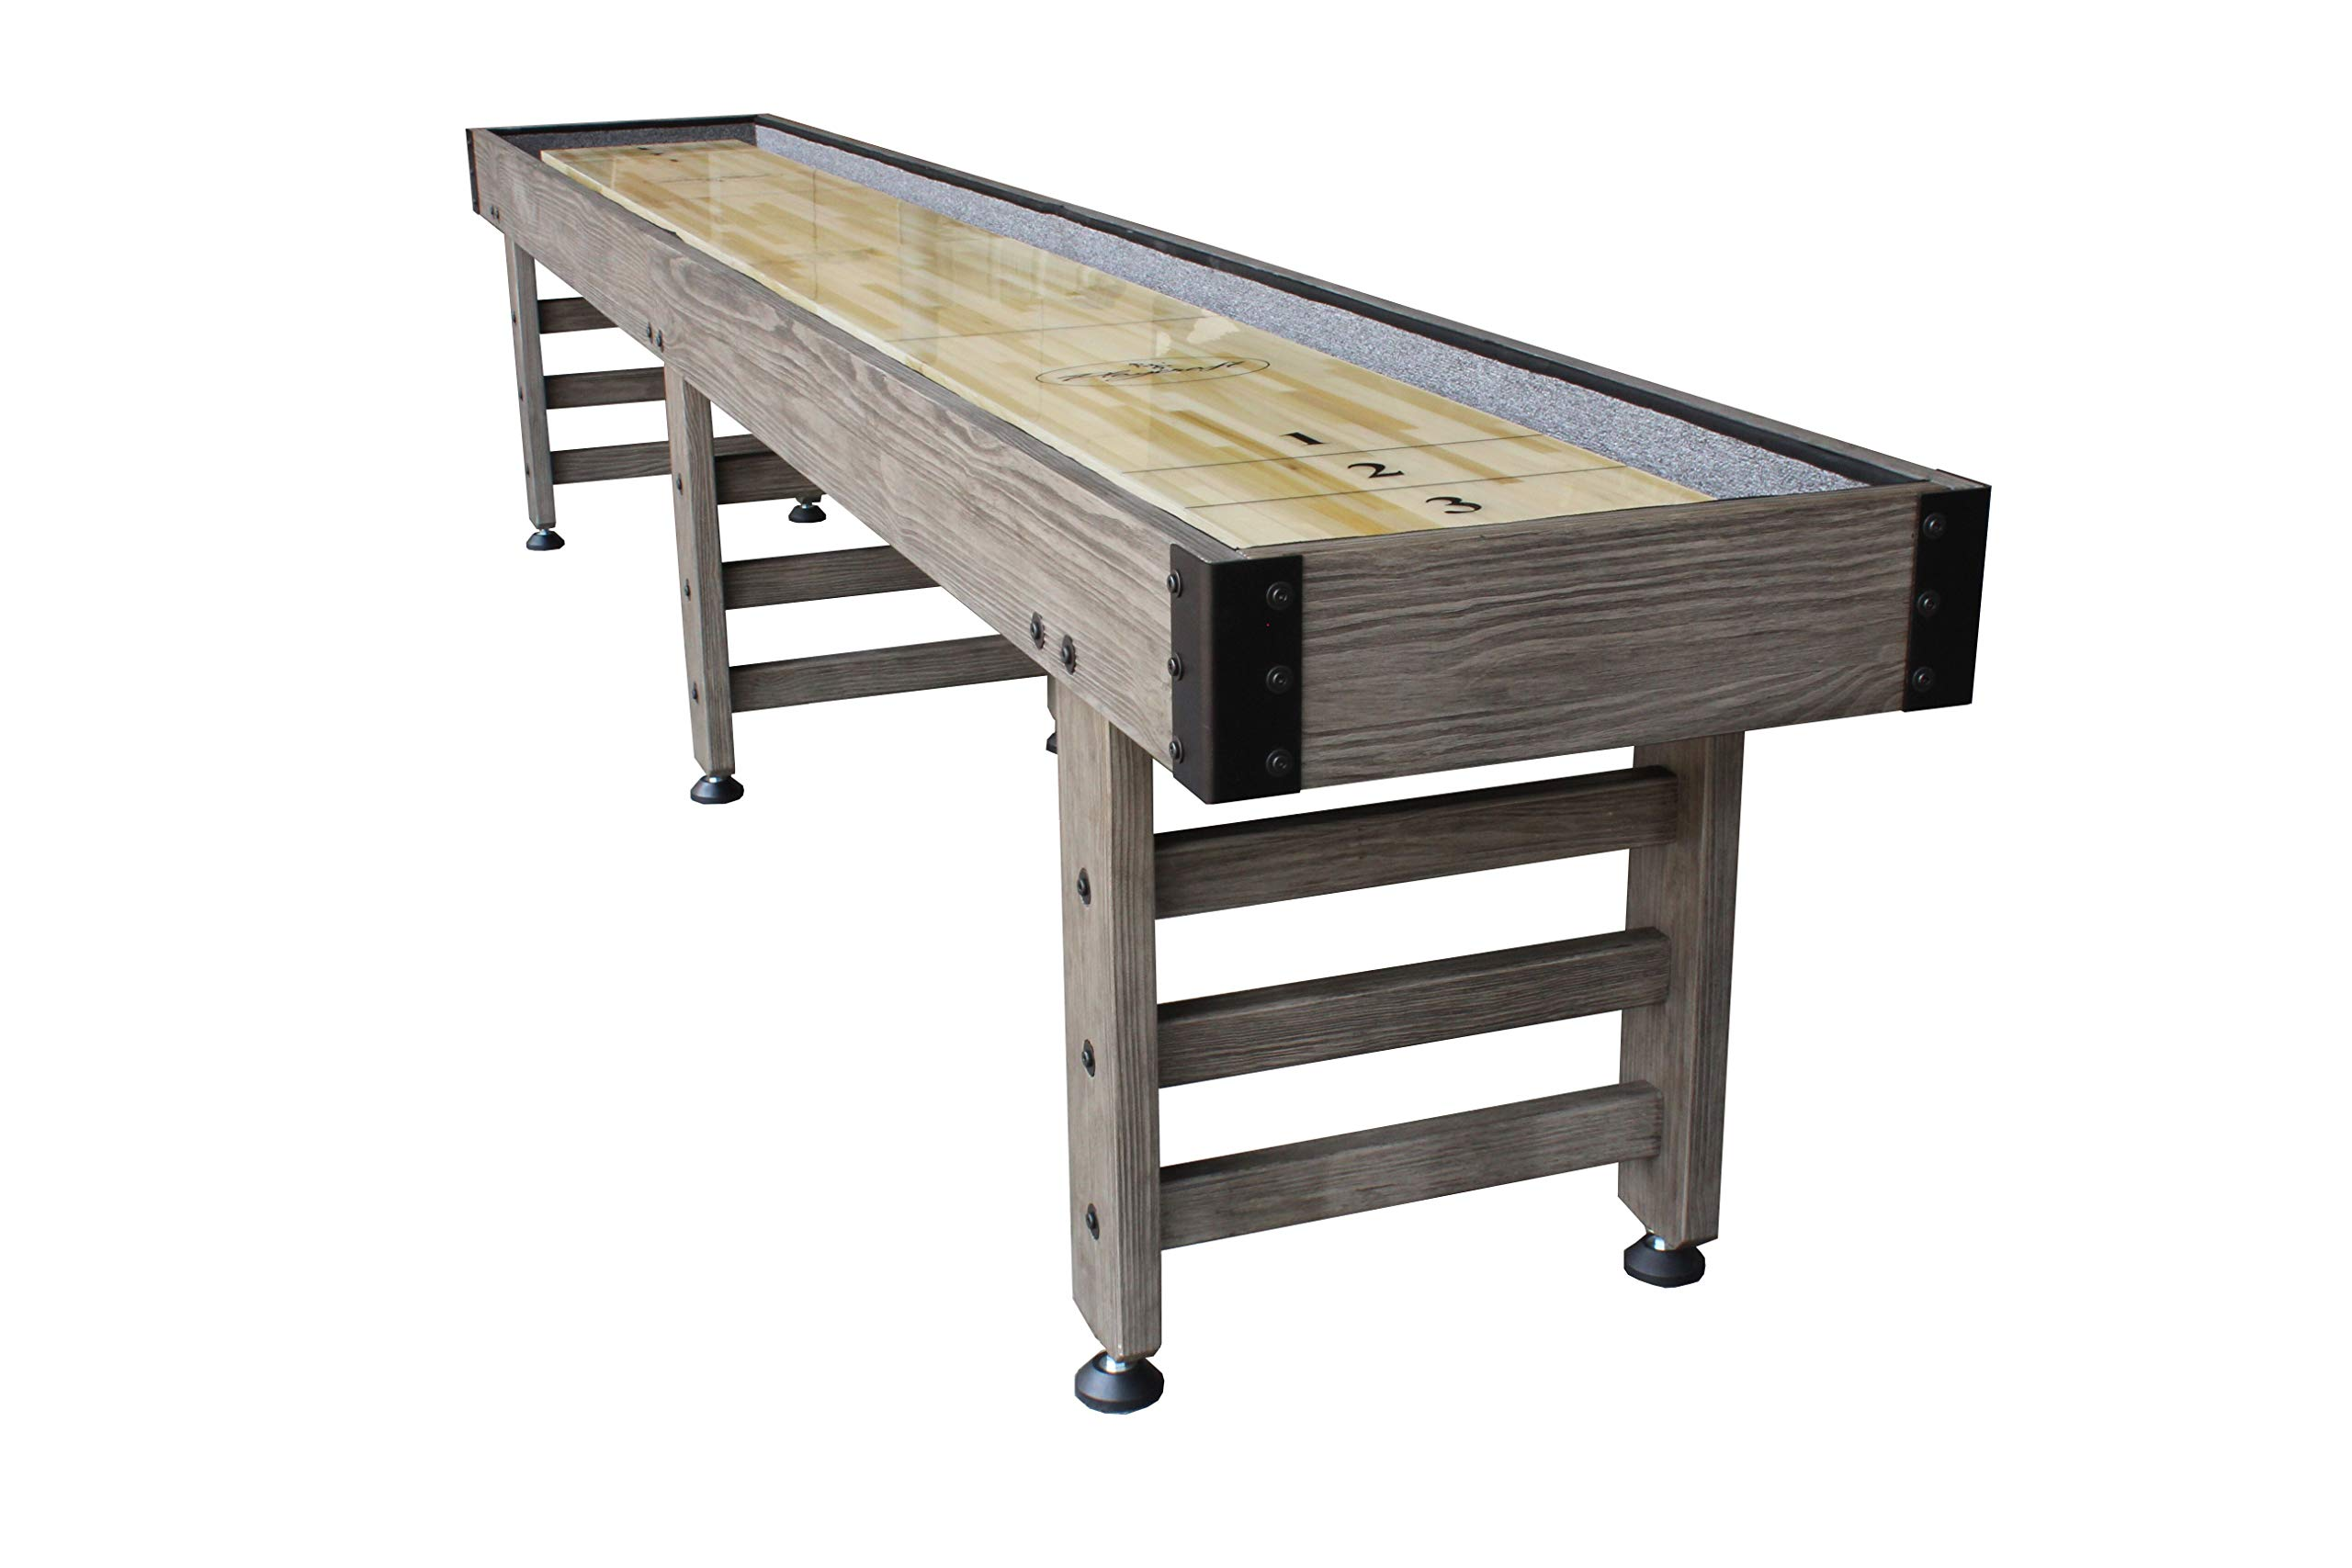 Playcraft Saybrook Smoke 16' Shuffleboard Table by Playcraft